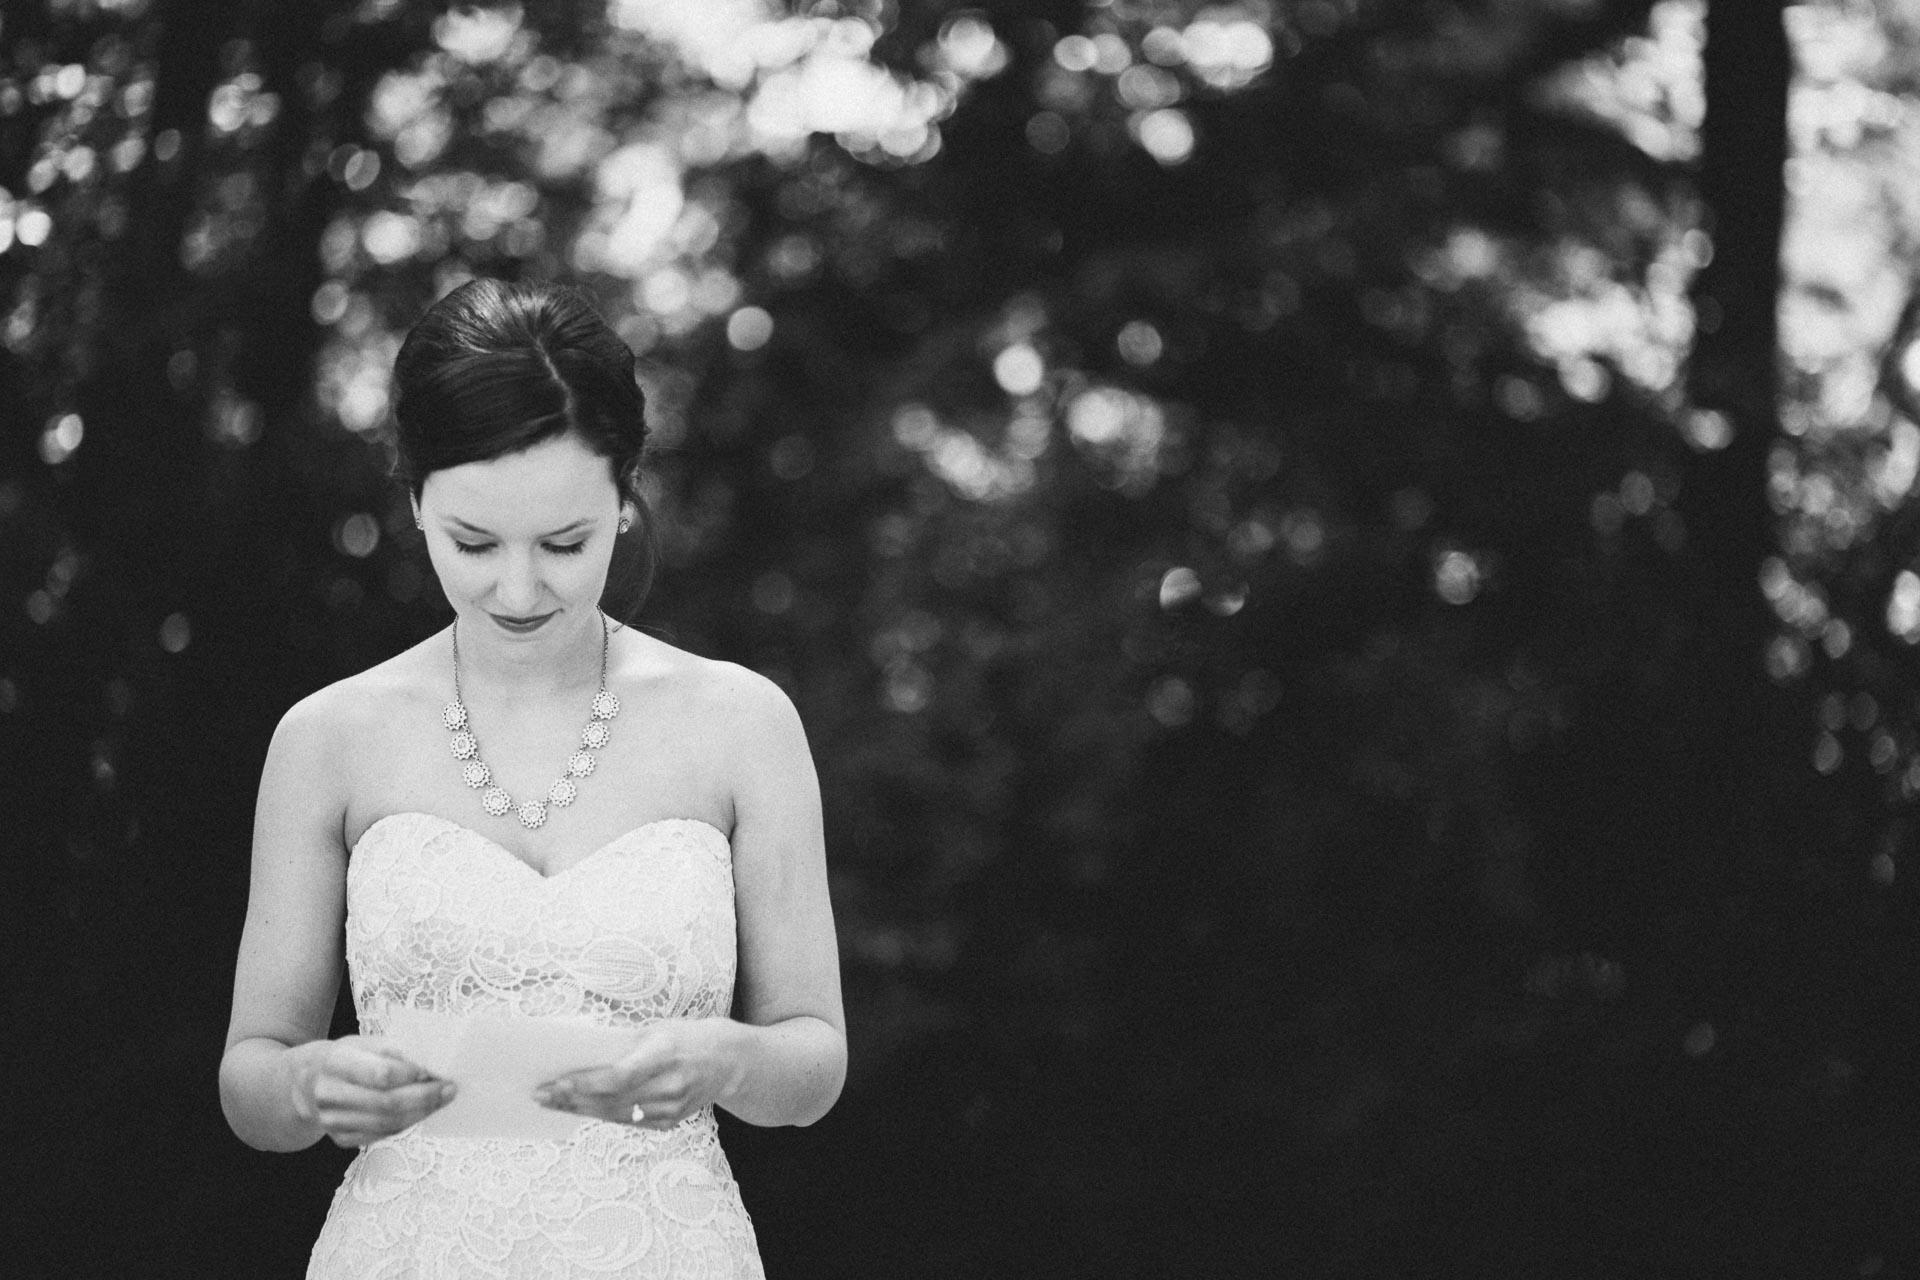 Julia-Michael-Cincinnati-Music-Hall-Wedding-028@2x.jpg